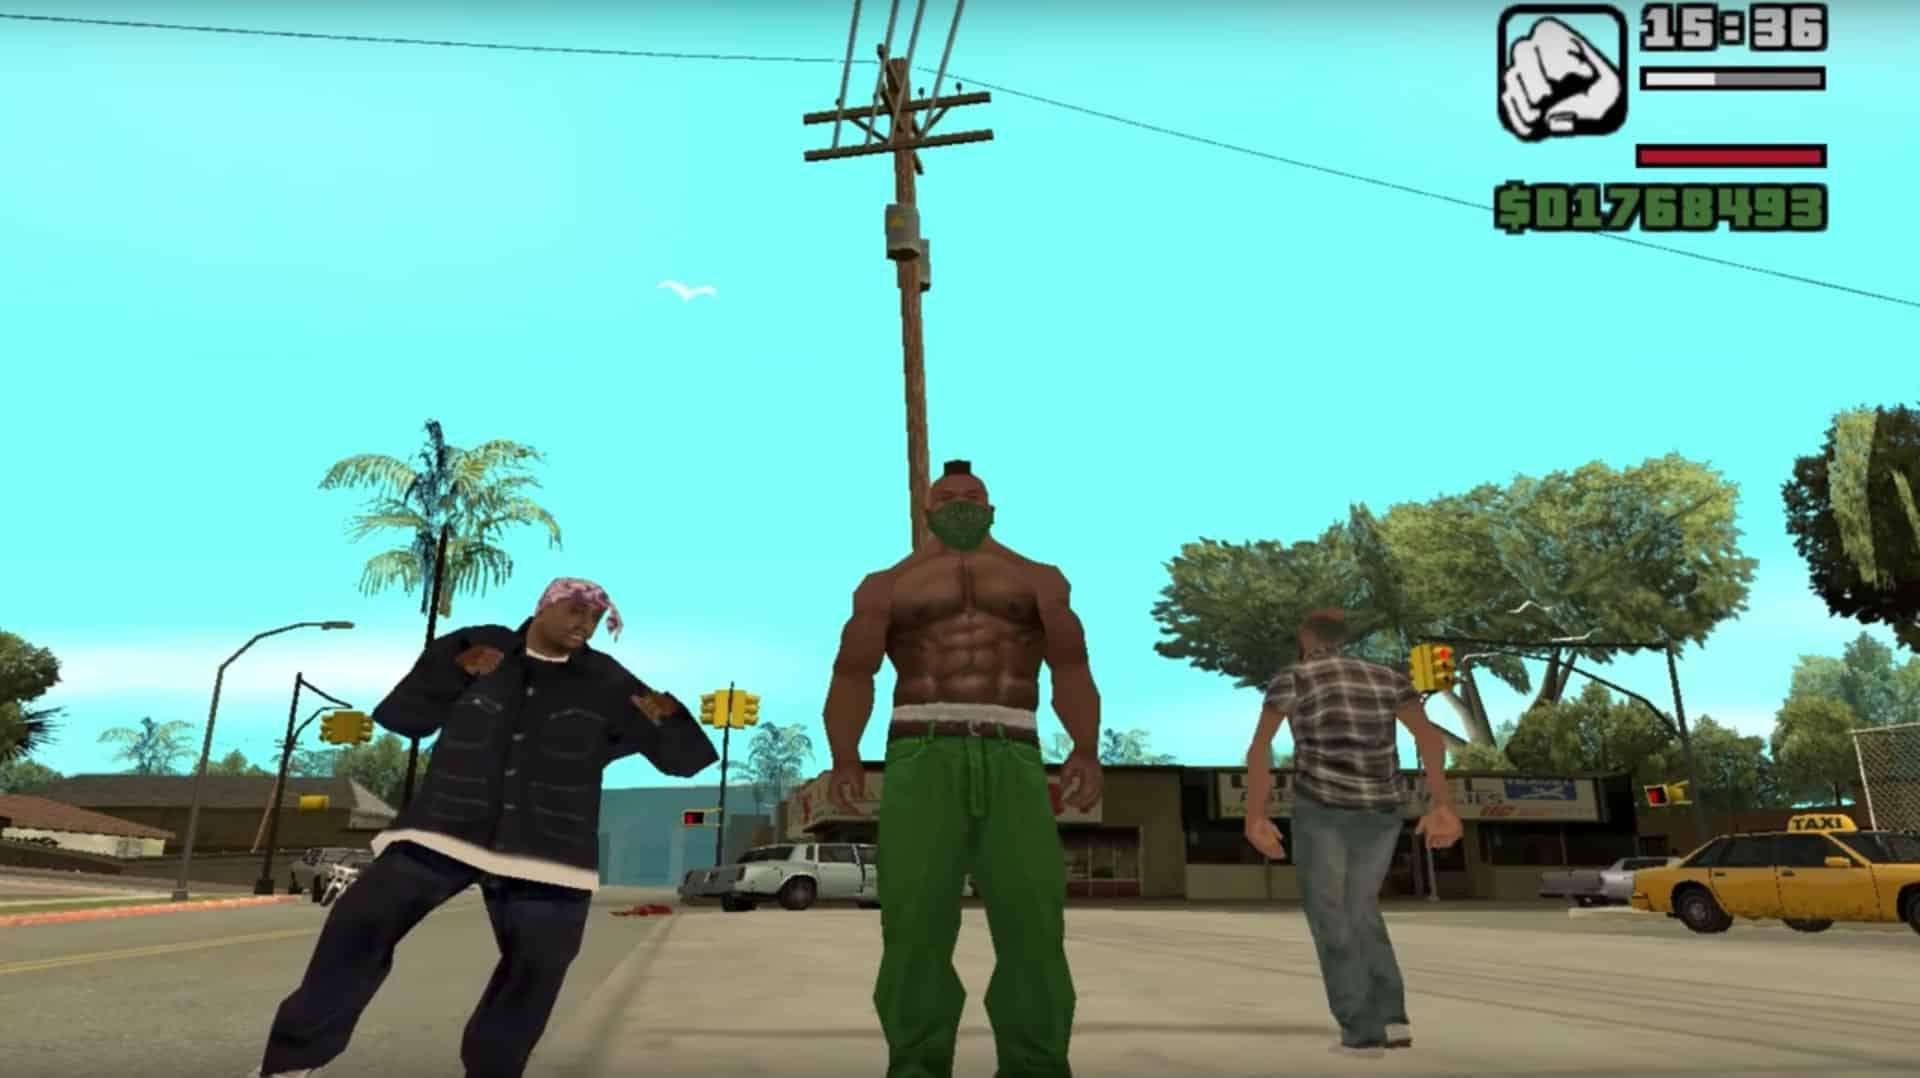 Gta San Andreas Cheats For All Playstation Consoles Gta Boom